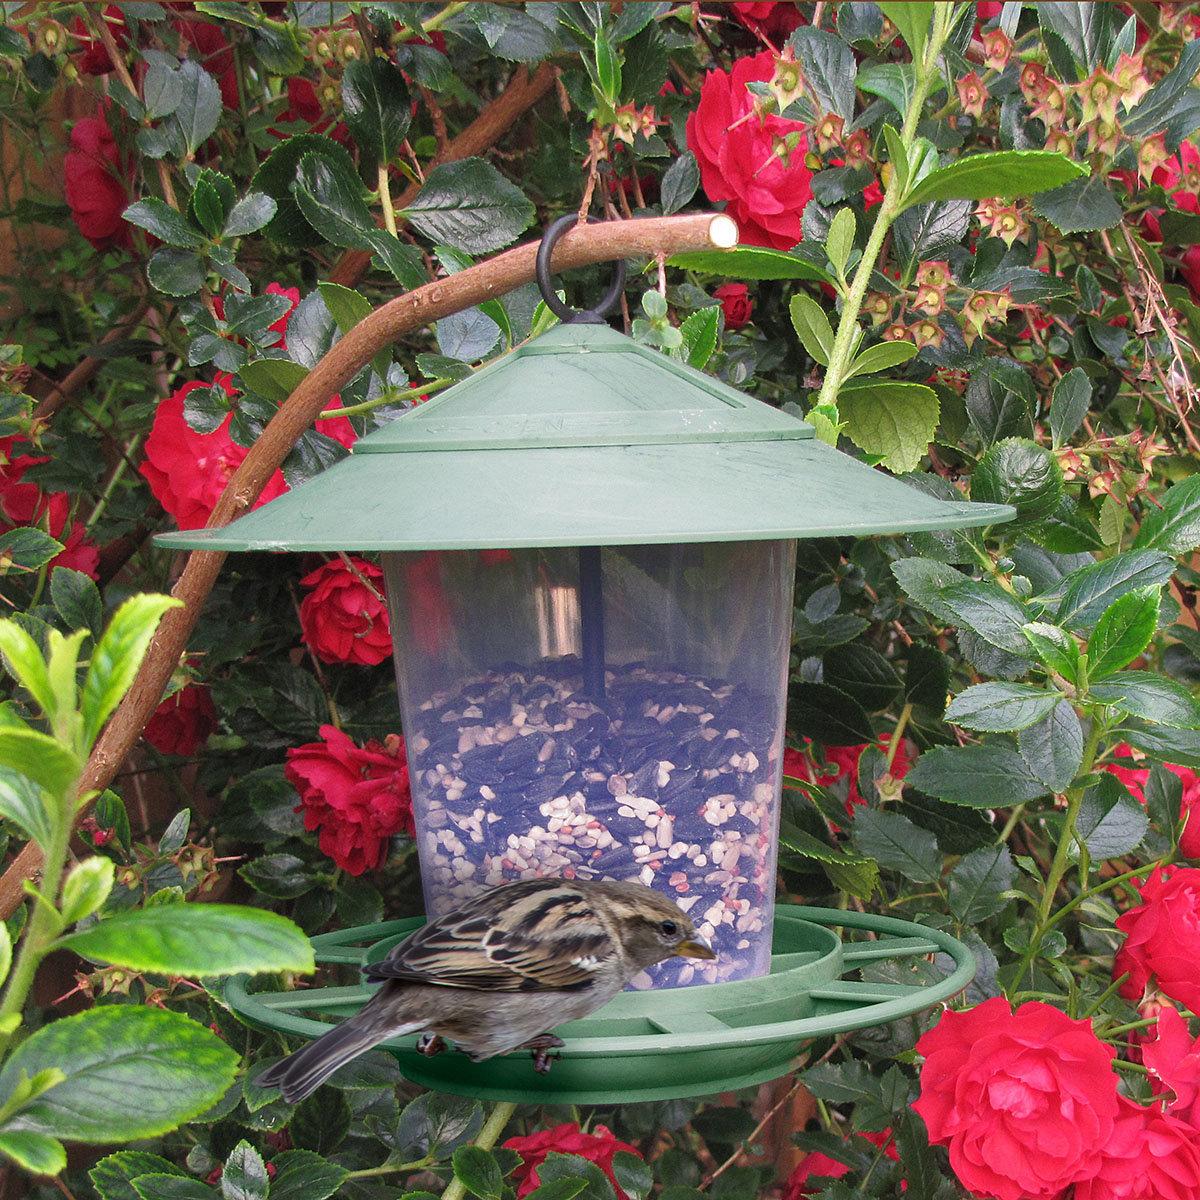 Vogelfutterhaus Recycle